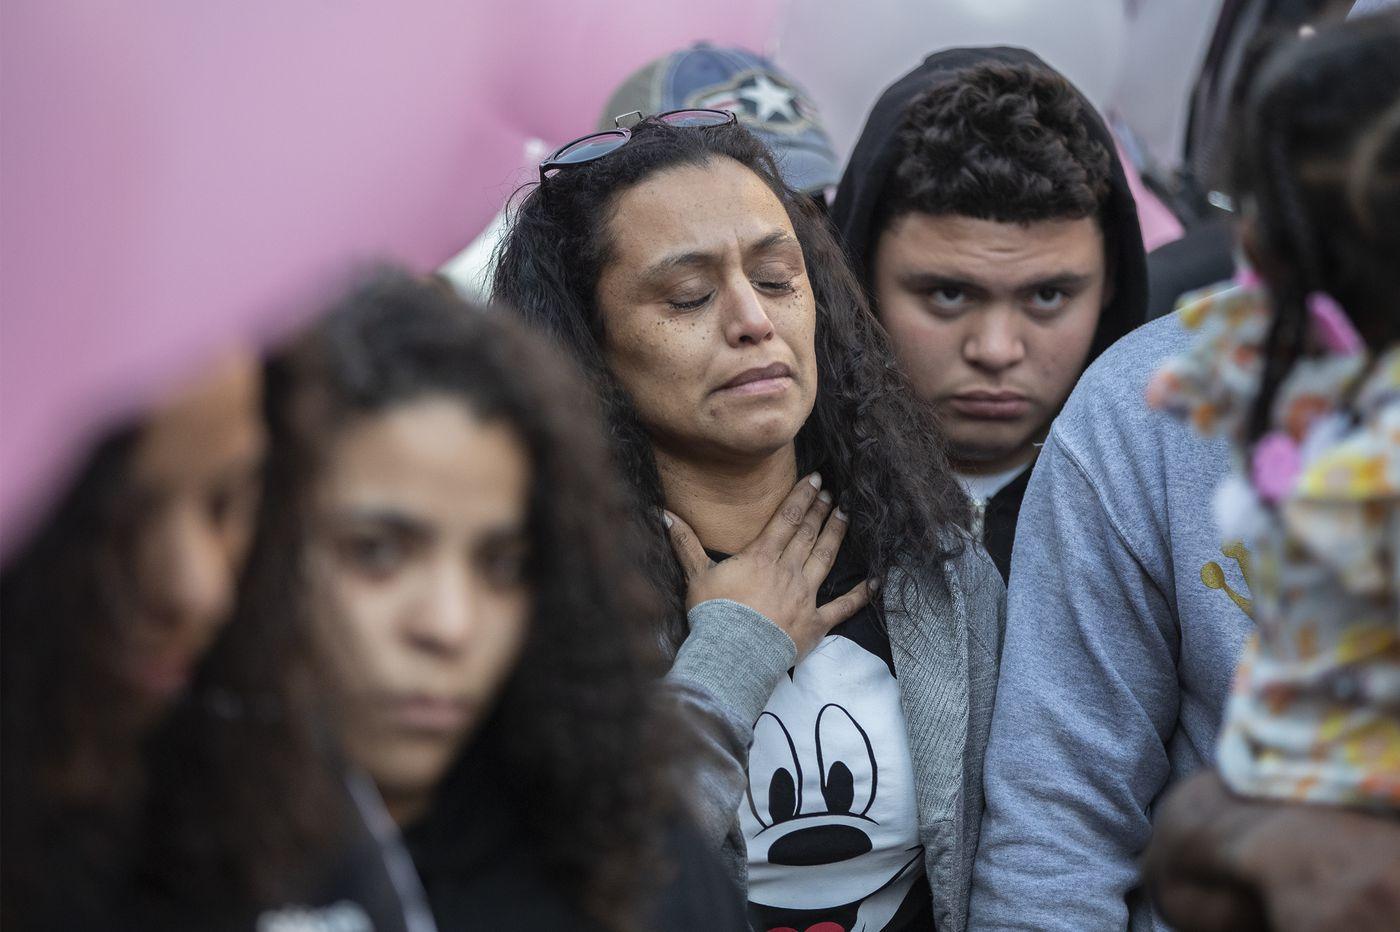 Have we surrendered to gun violence? Babies being shot suggests we have. | Helen Ubiñas